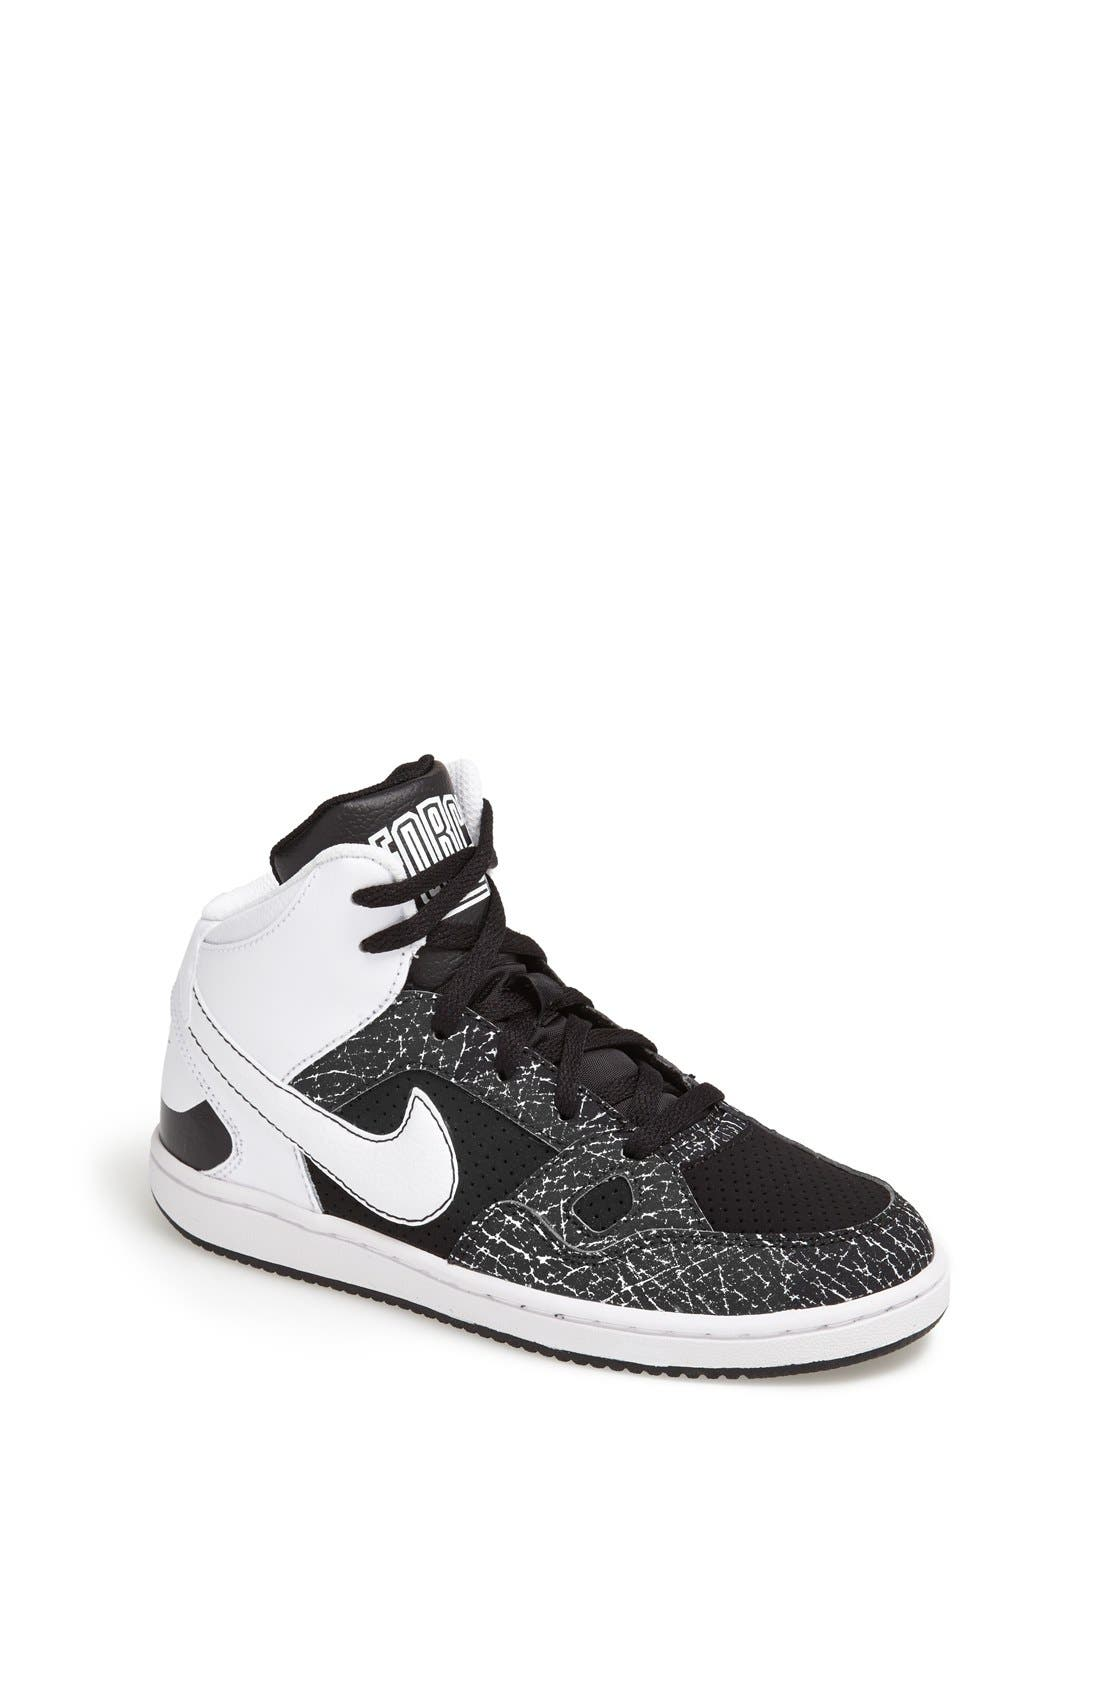 Alternate Image 1 Selected - Nike 'Son of Force' Sneaker (Toddler & Little Kid)